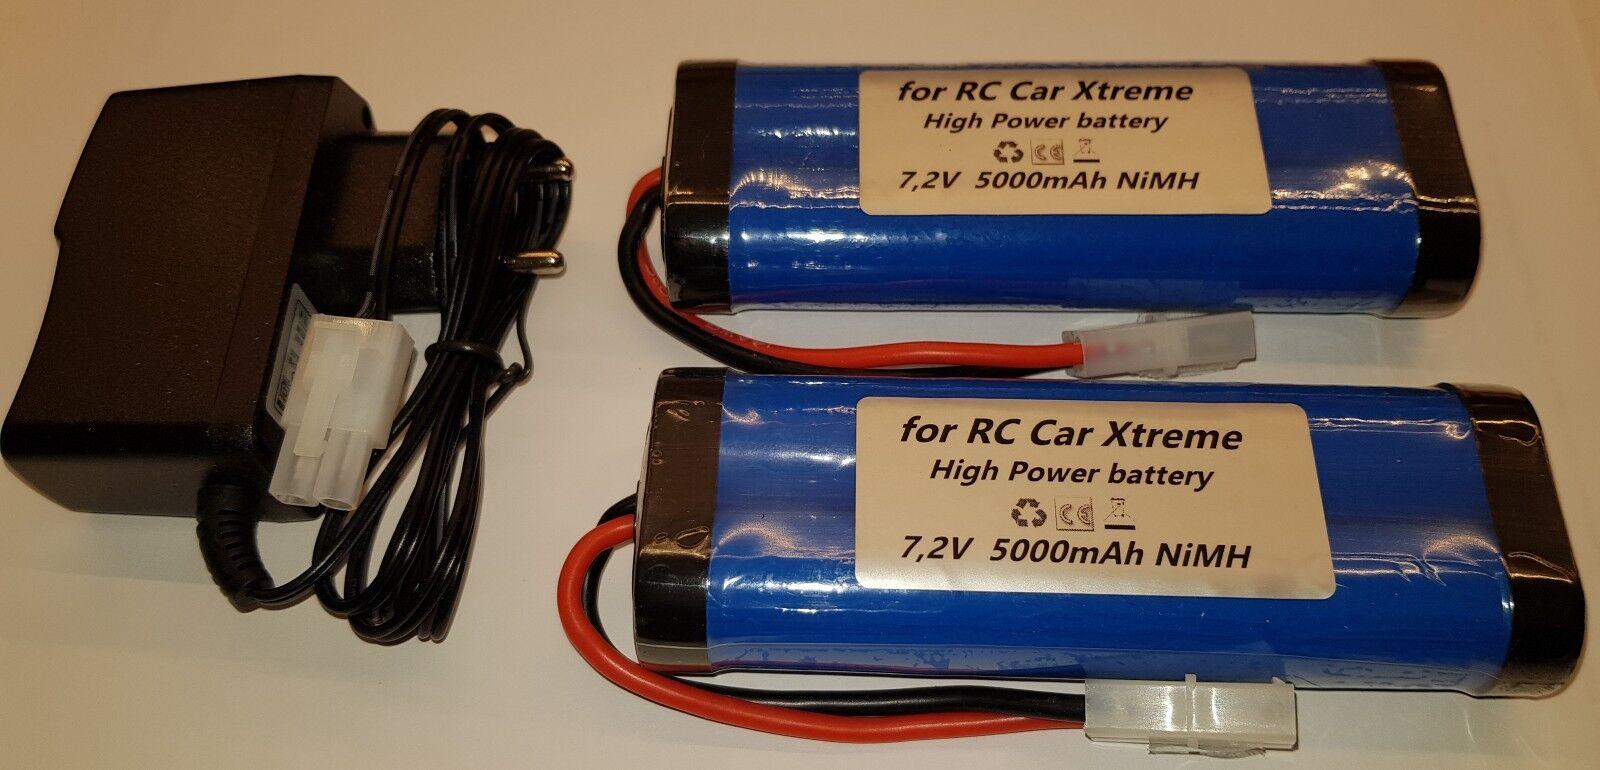 2 x 6-Zeller 7,2v 5000mAh X-Treme Rc Spina Tamiya Incl. 1 x Caricabatteria